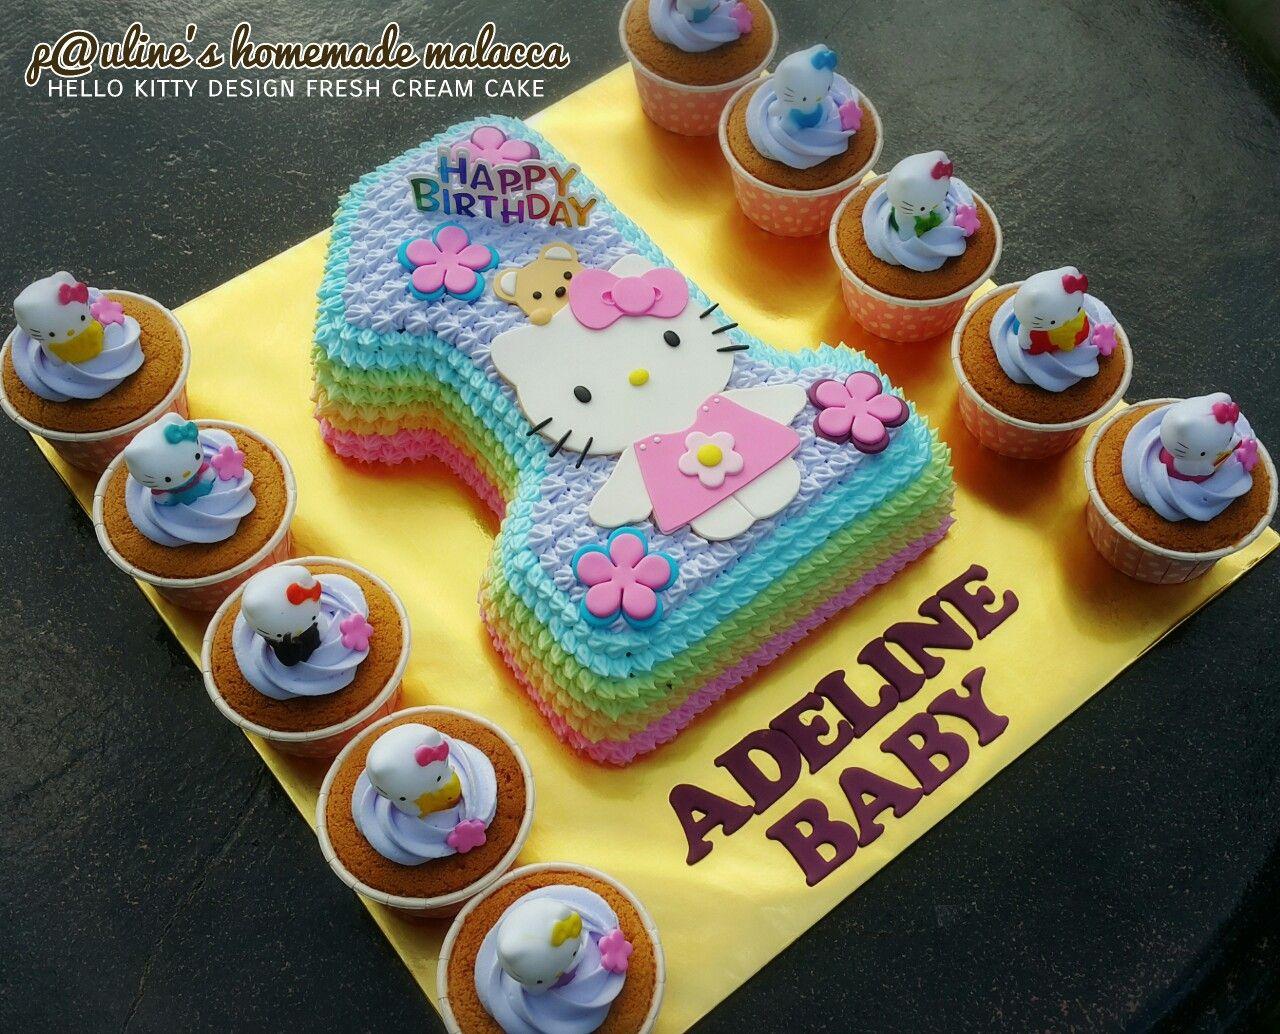 Hello Kitty Happy 1st Birthday Paulineshomemademalacca Kids Cake Bakery Cakes Happy 1st Birthdays,Short Hair Design For Wedding Party